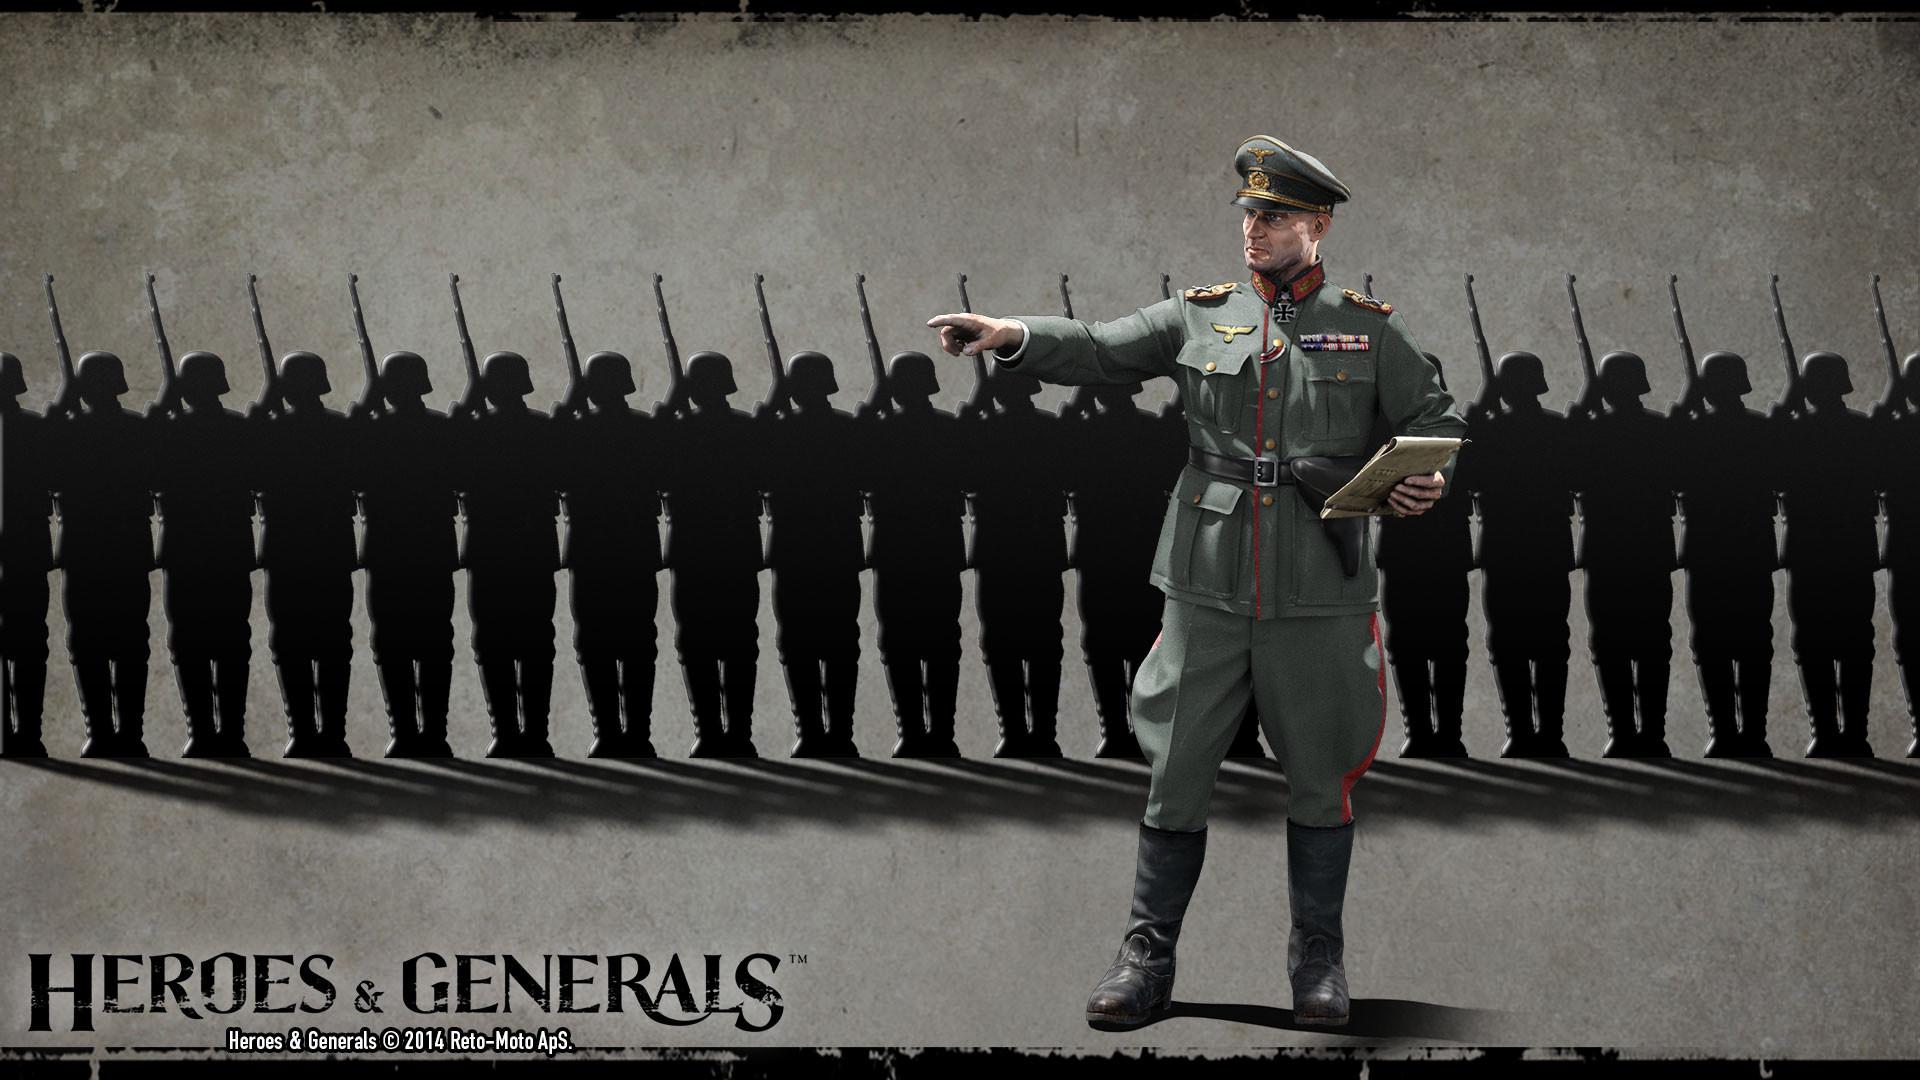 b8e03758062d2484ef031eb4eef05f12.jpg German_General.jpg